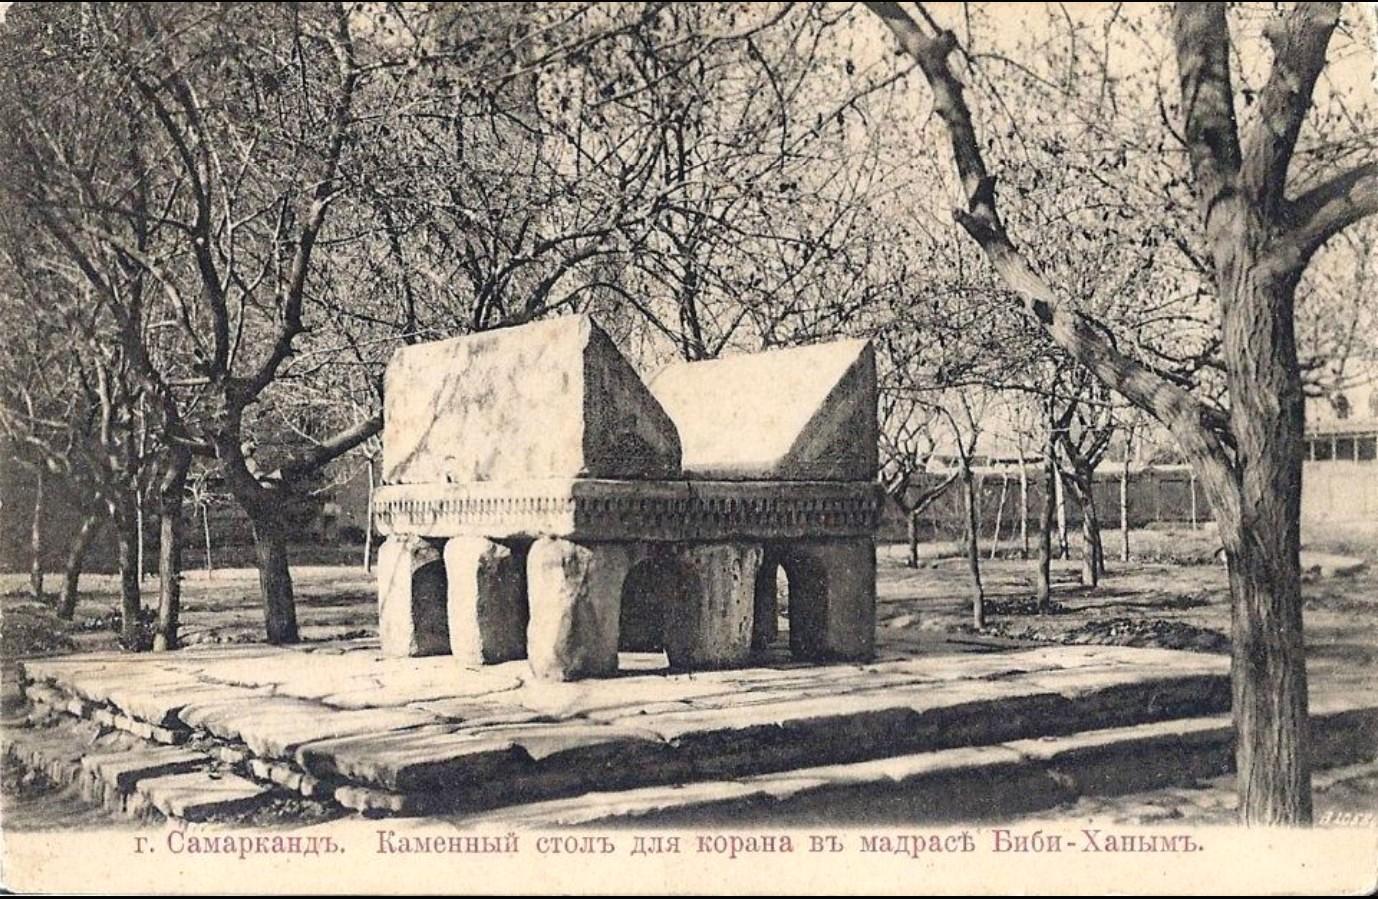 Каменный стол для корана в медресе Биби-Ханум